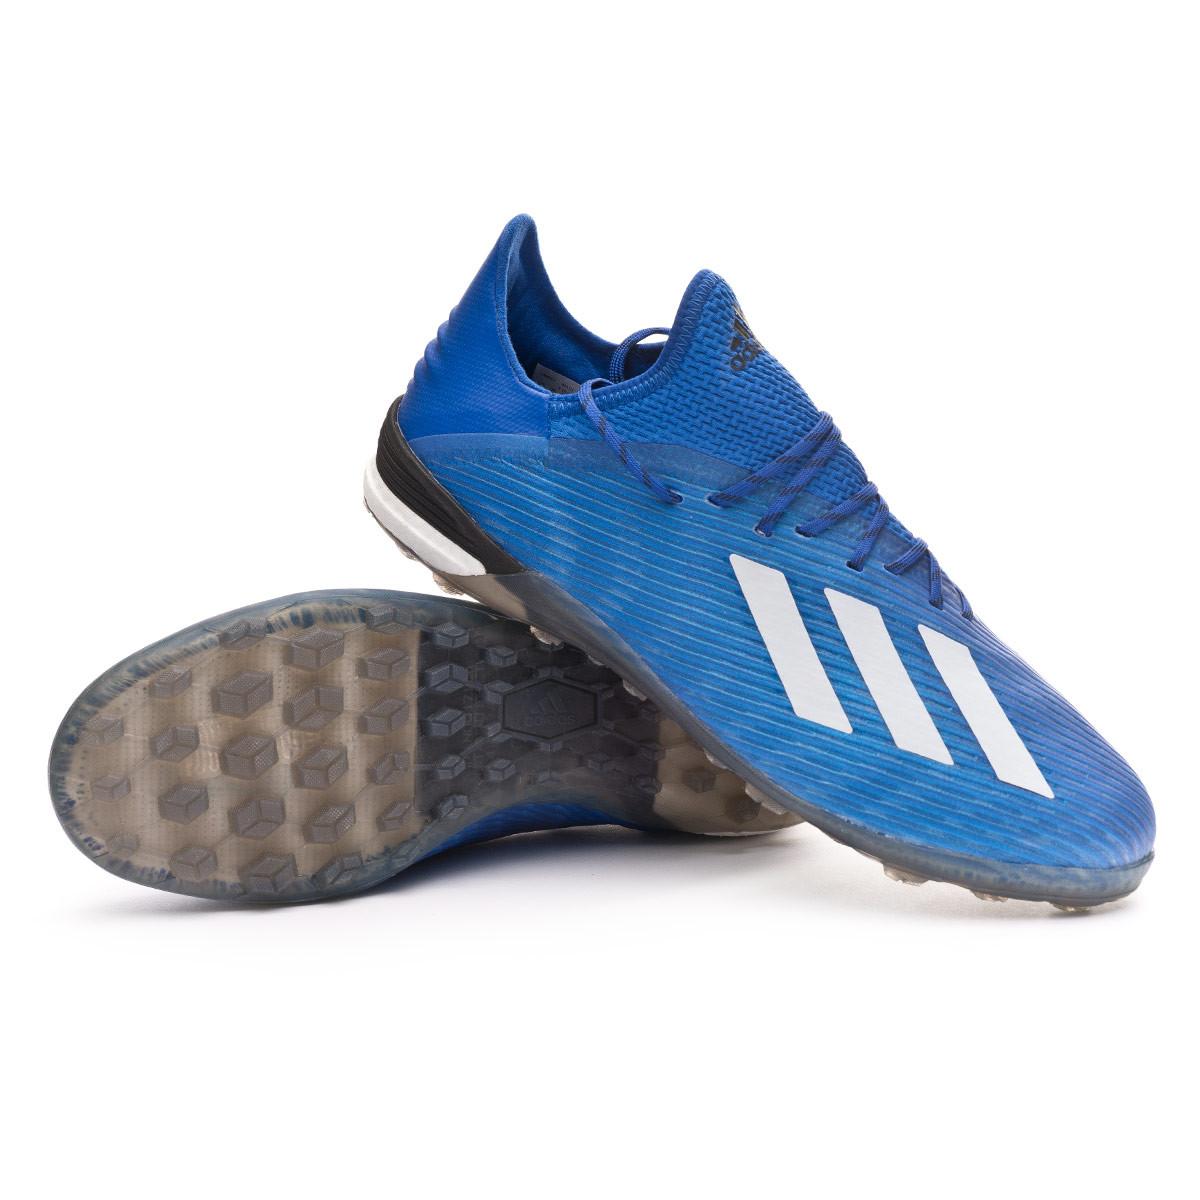 Football Boot adidas X 19.1 Turf Team